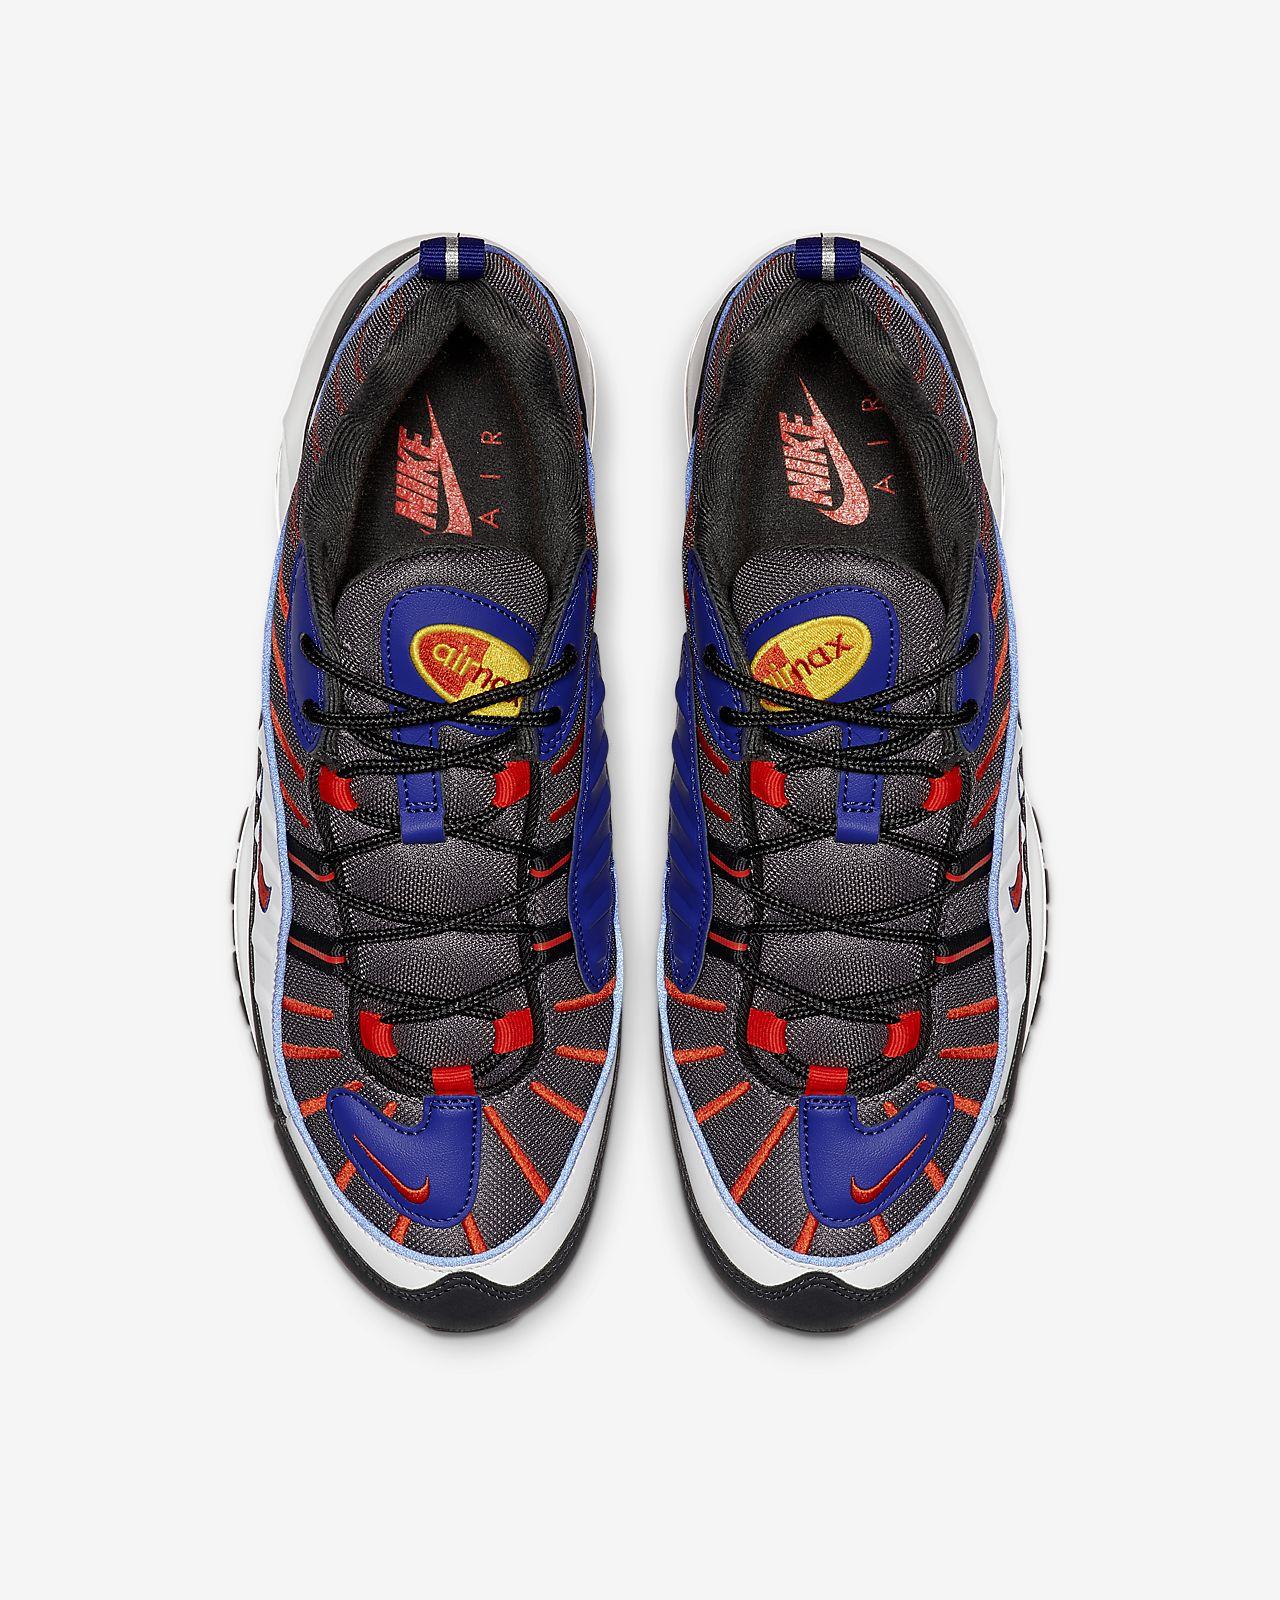 sports shoes 78e1d 9eb29 Nike Air Max 98 Men's Shoe